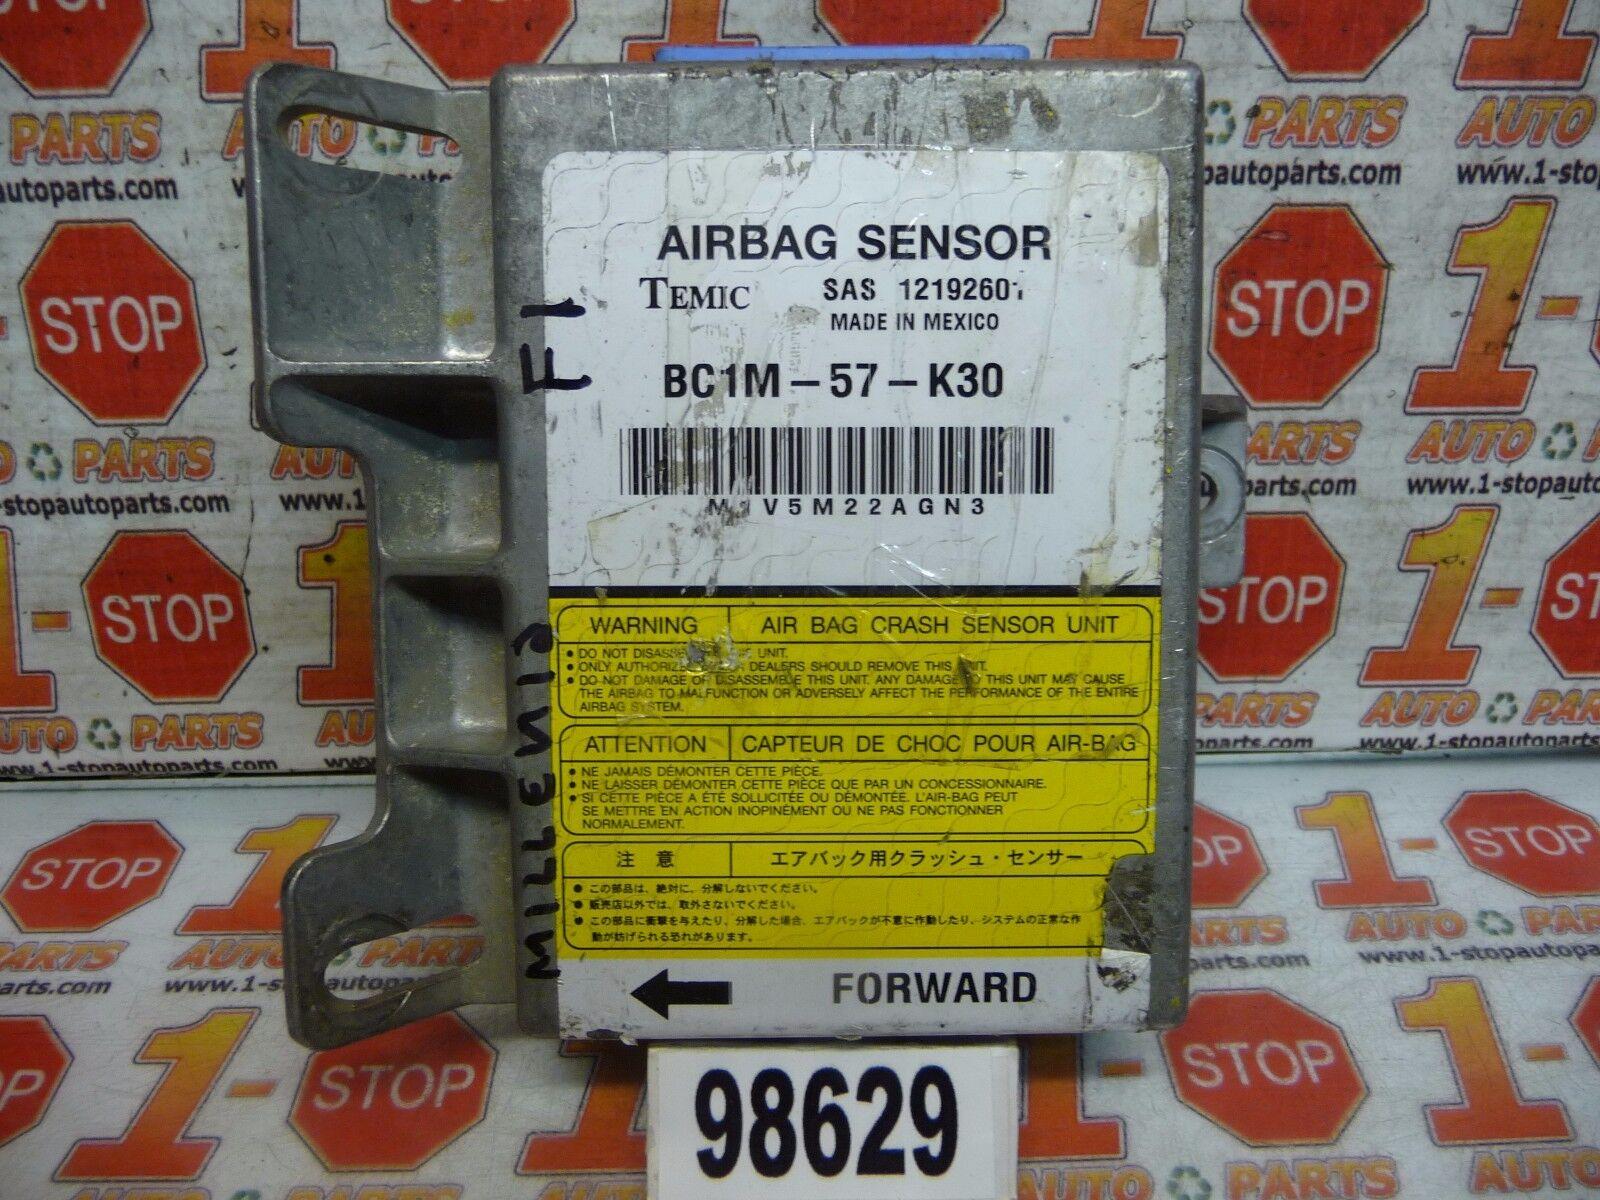 95 96 97 98 Mazda Millenia Srs Control Module Bc1m 57 K30 1219260 Fuse Box Picture 1 Of 6